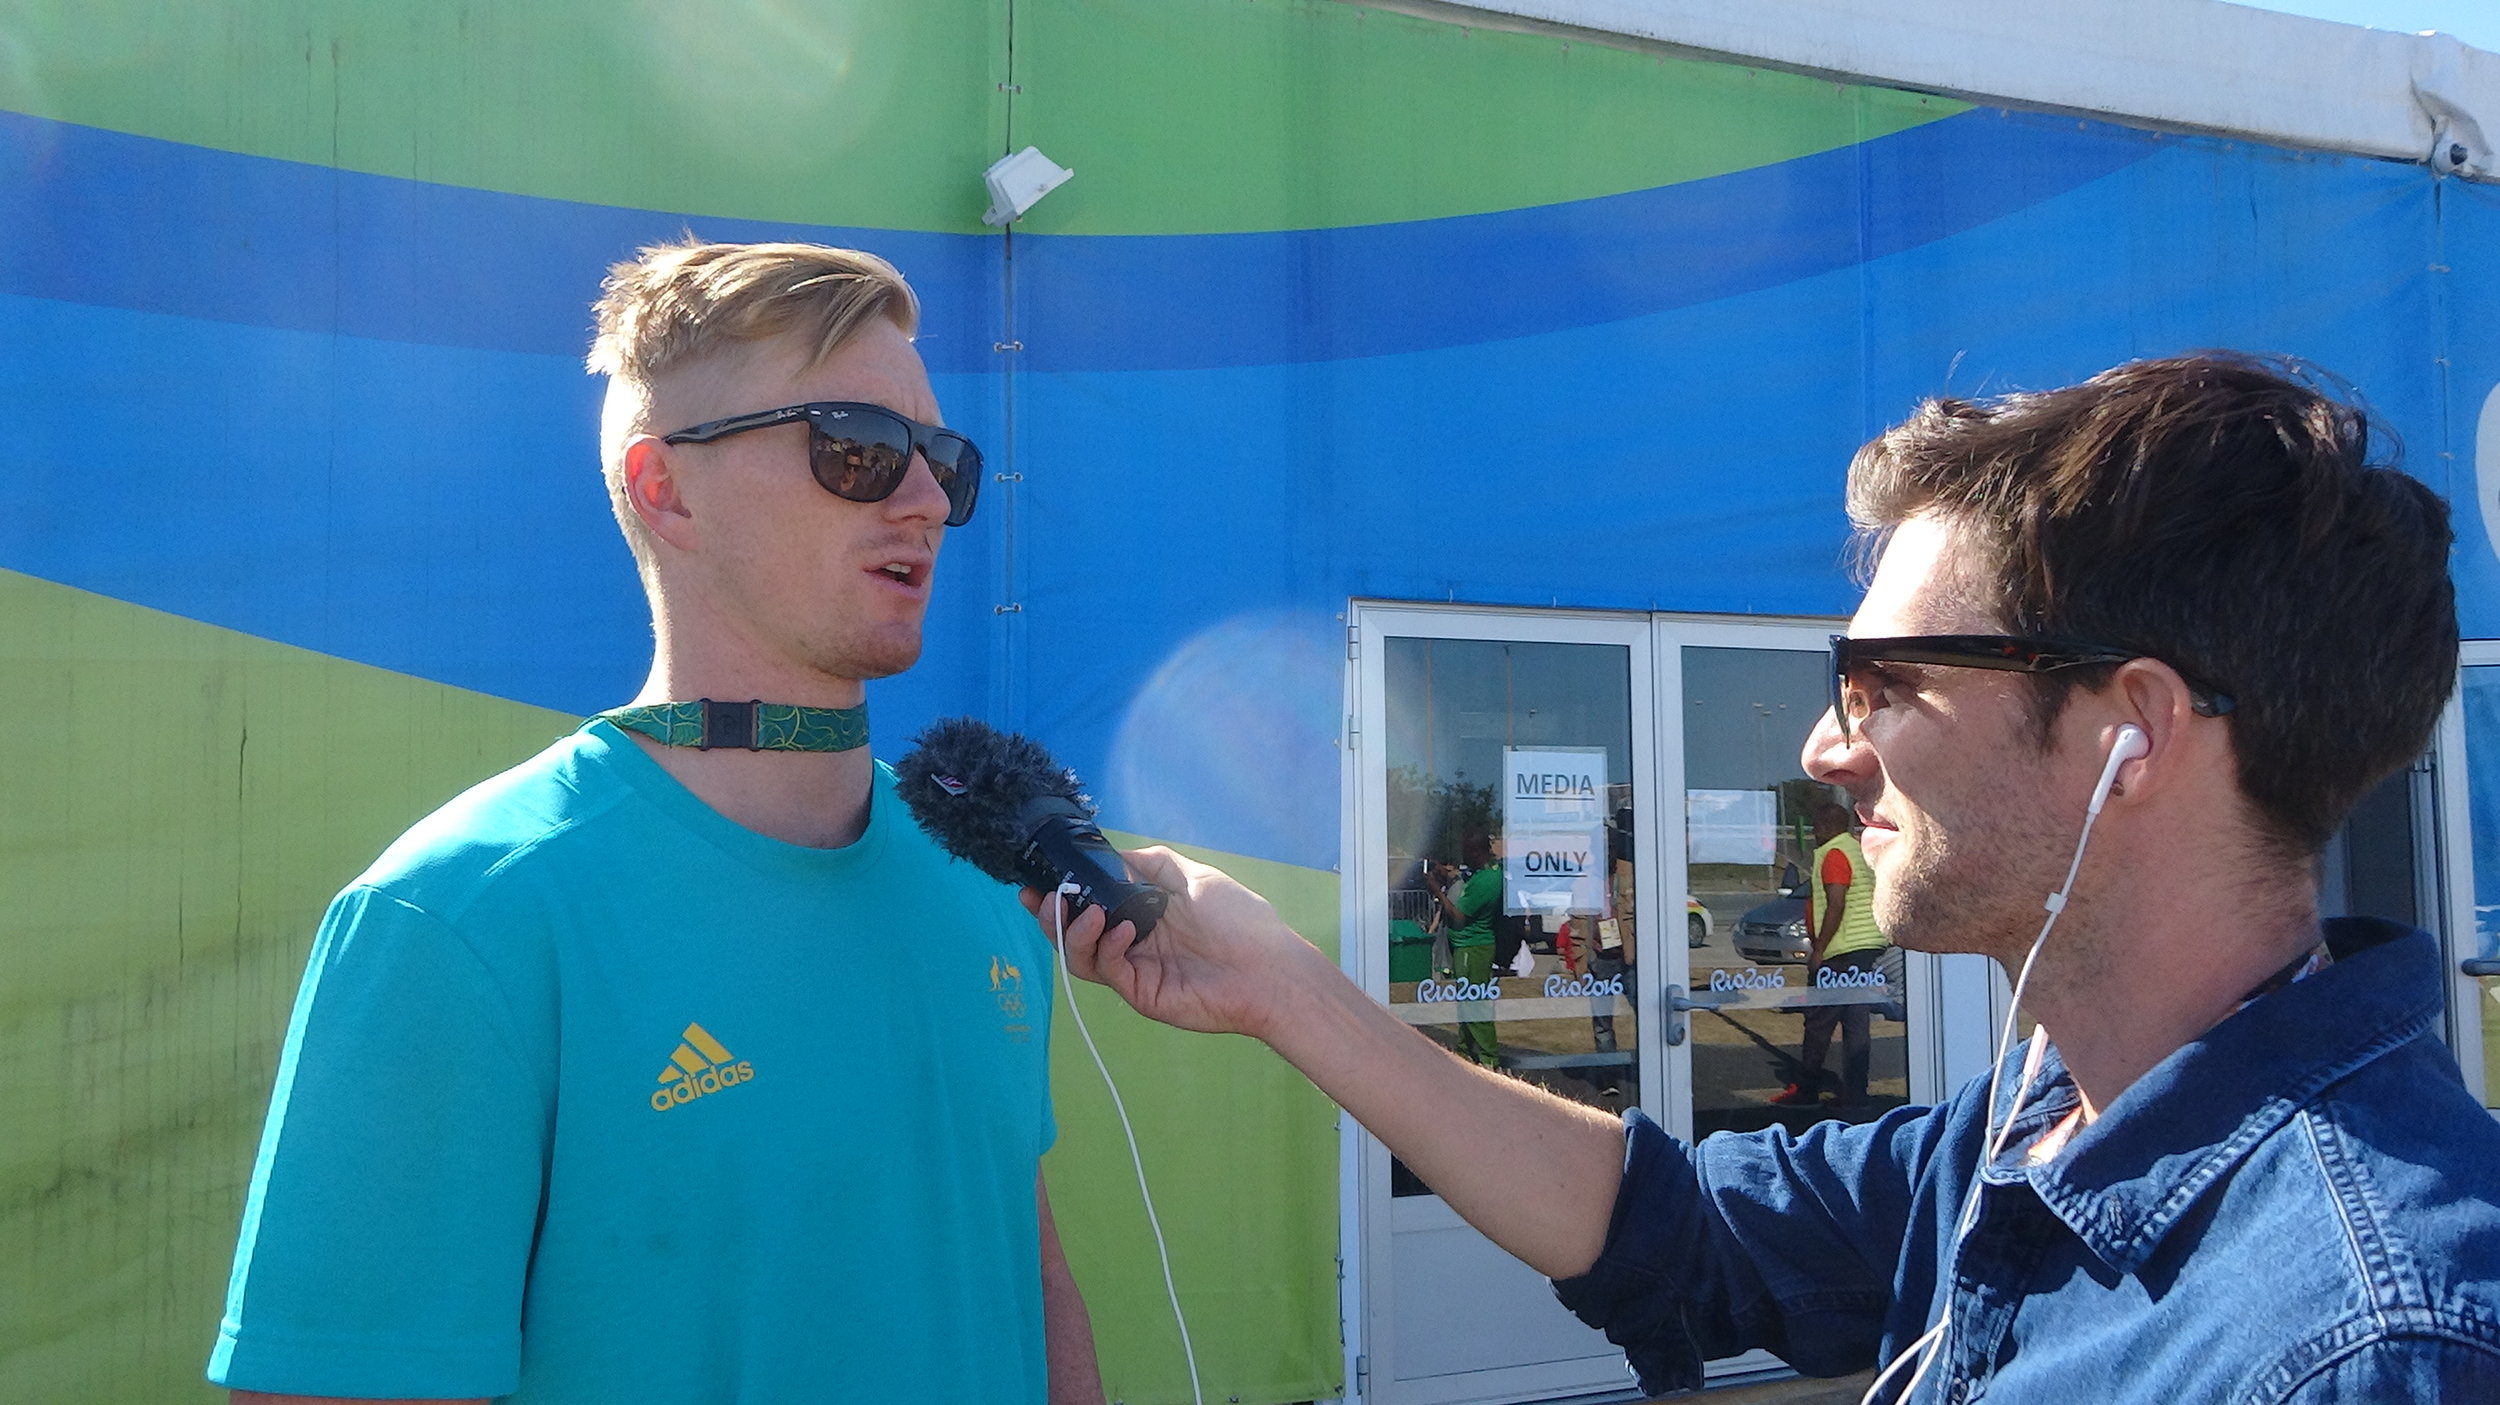 Tom Ellis interviews Dan Smith